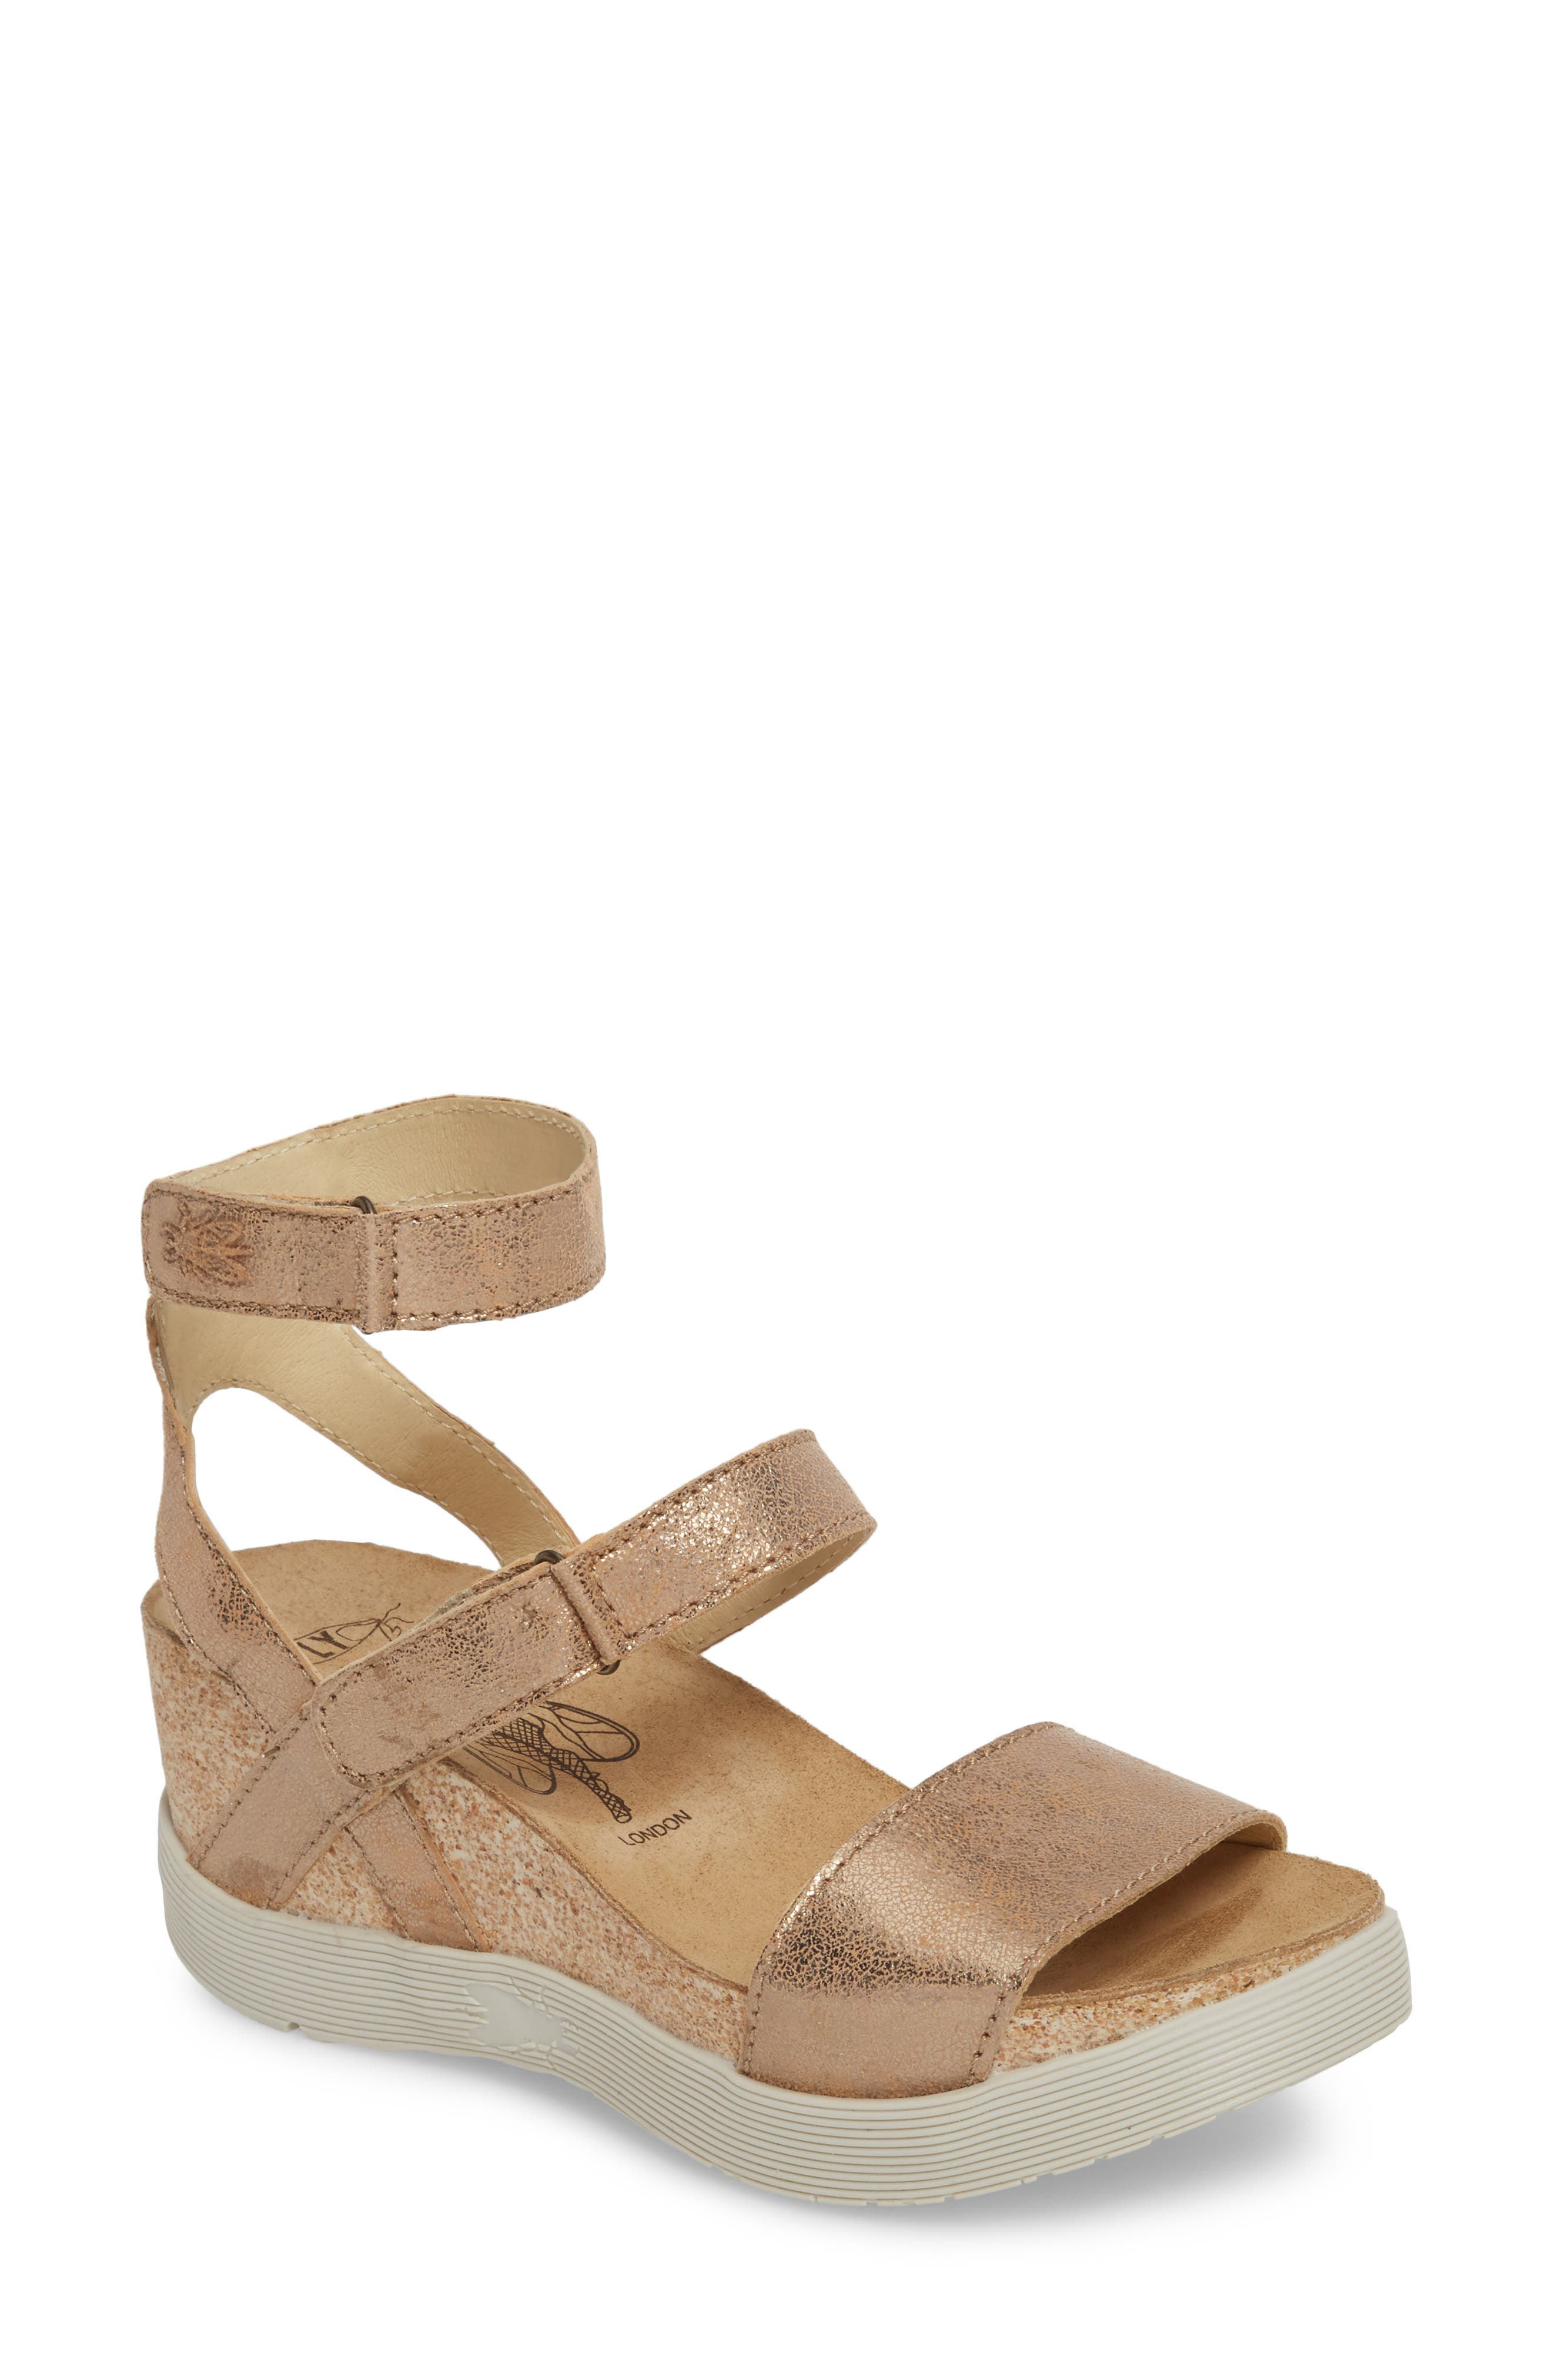 Alternate Image 1 Selected - Fly London Wink Platform Sandal (Women)